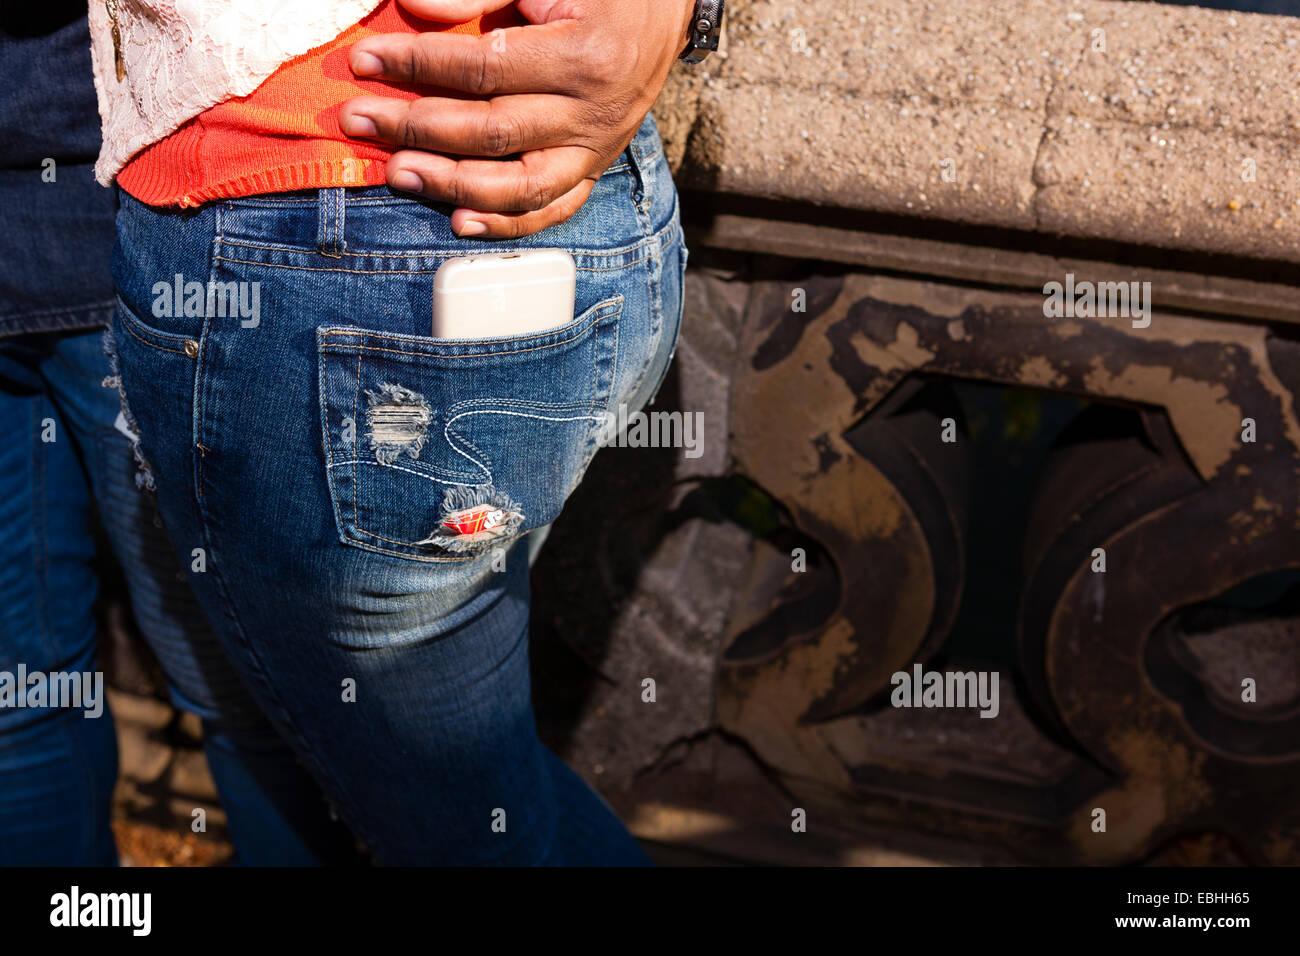 Smartphone in back pocket of jeans - Stock Image